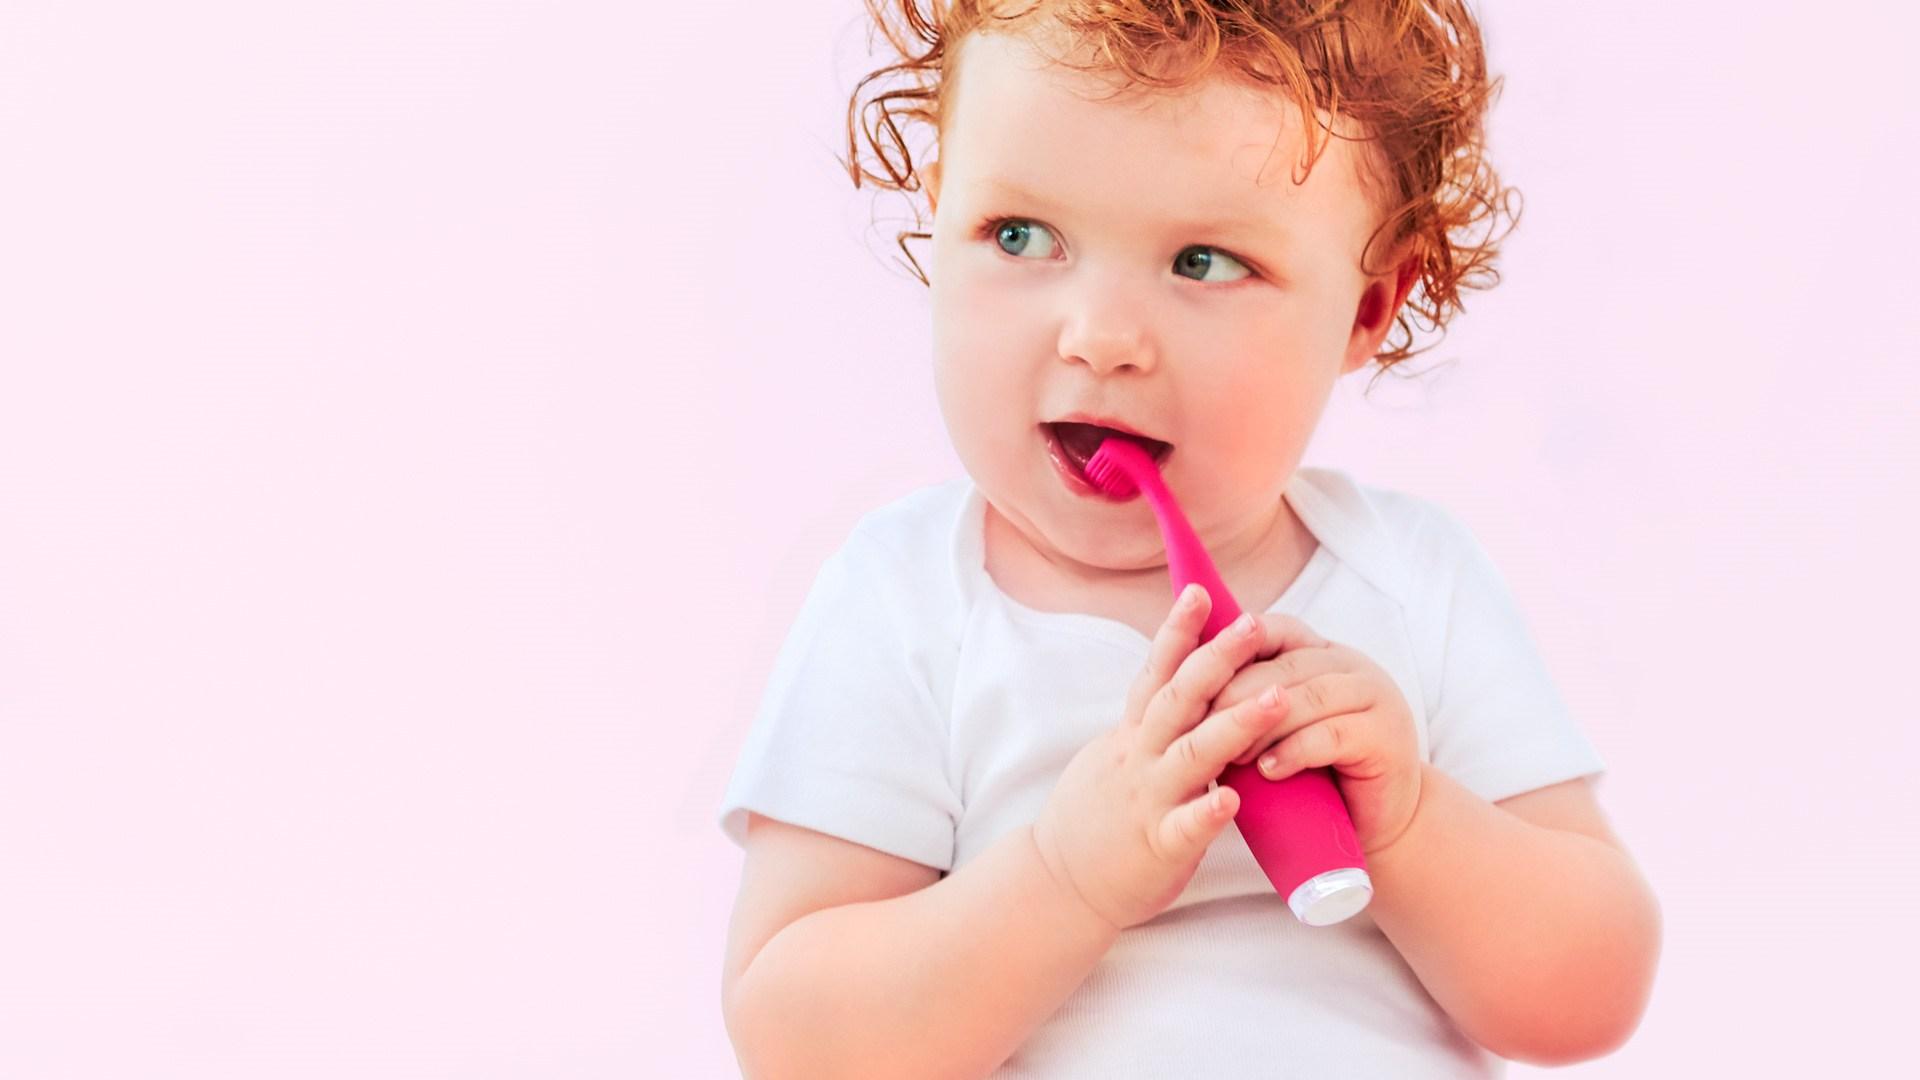 Ребенок со щеткой